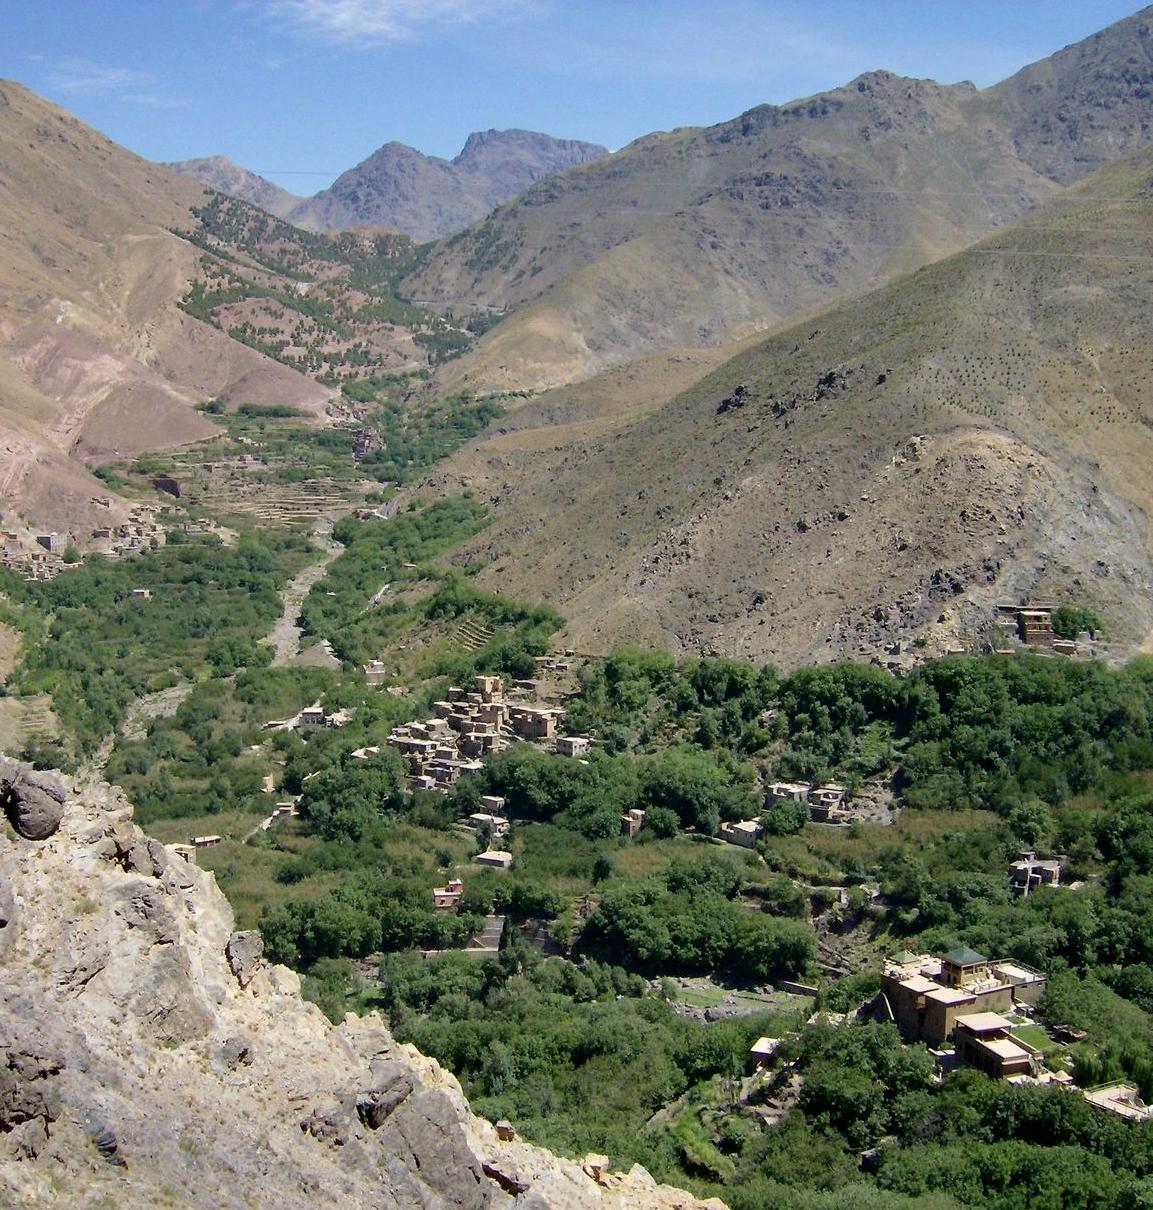 Toubkal - EL VALLE